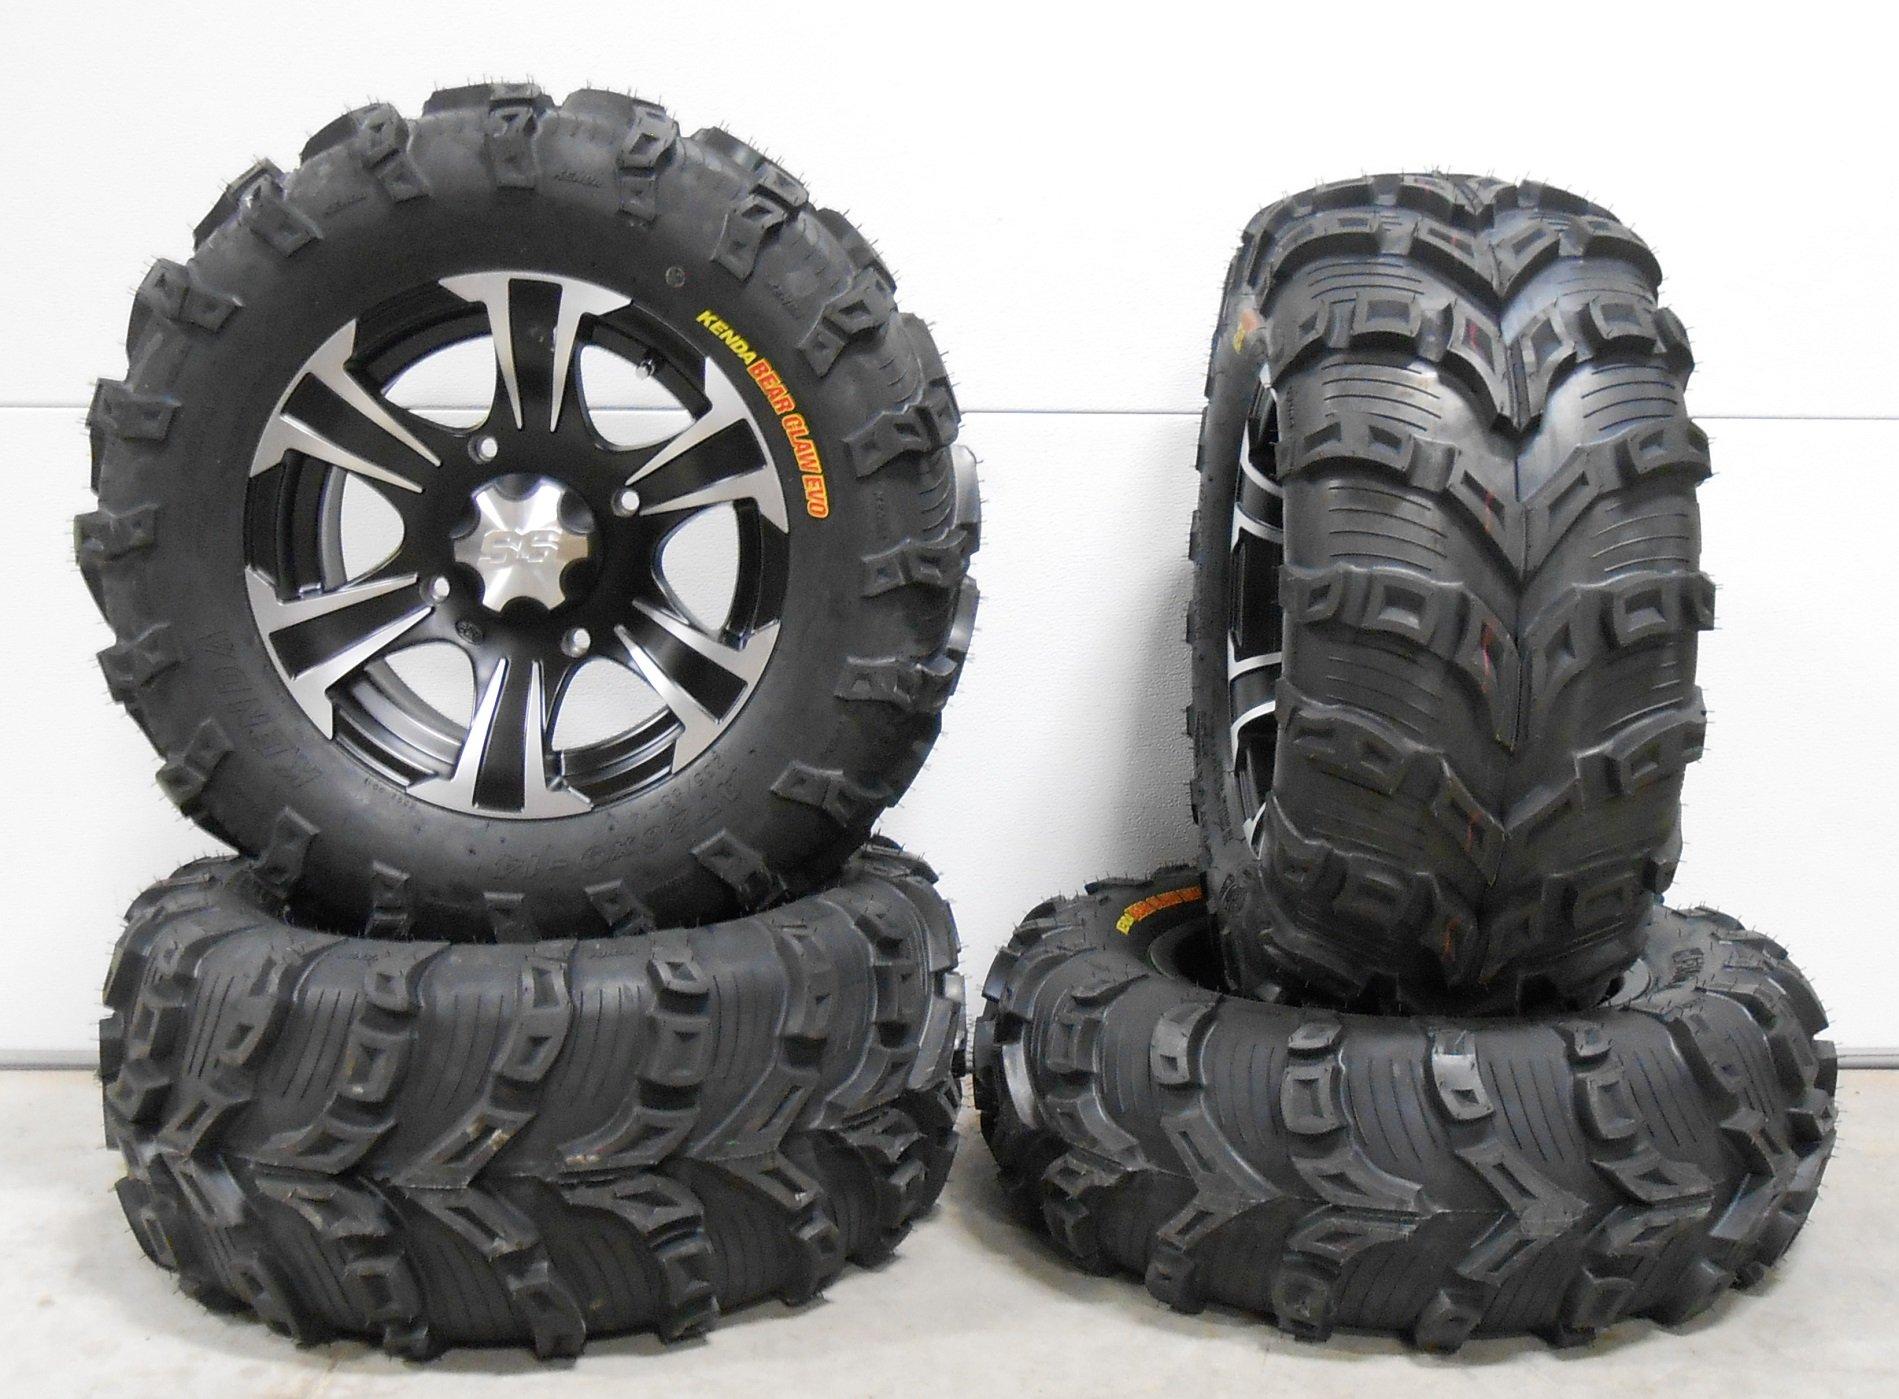 Bundle - 9 Items: ITP SS312 14'' Wheels Black 26'' Bear Claw EVO Tires [4x156 Bolt Pattern 3/8x24 Lug Kit]